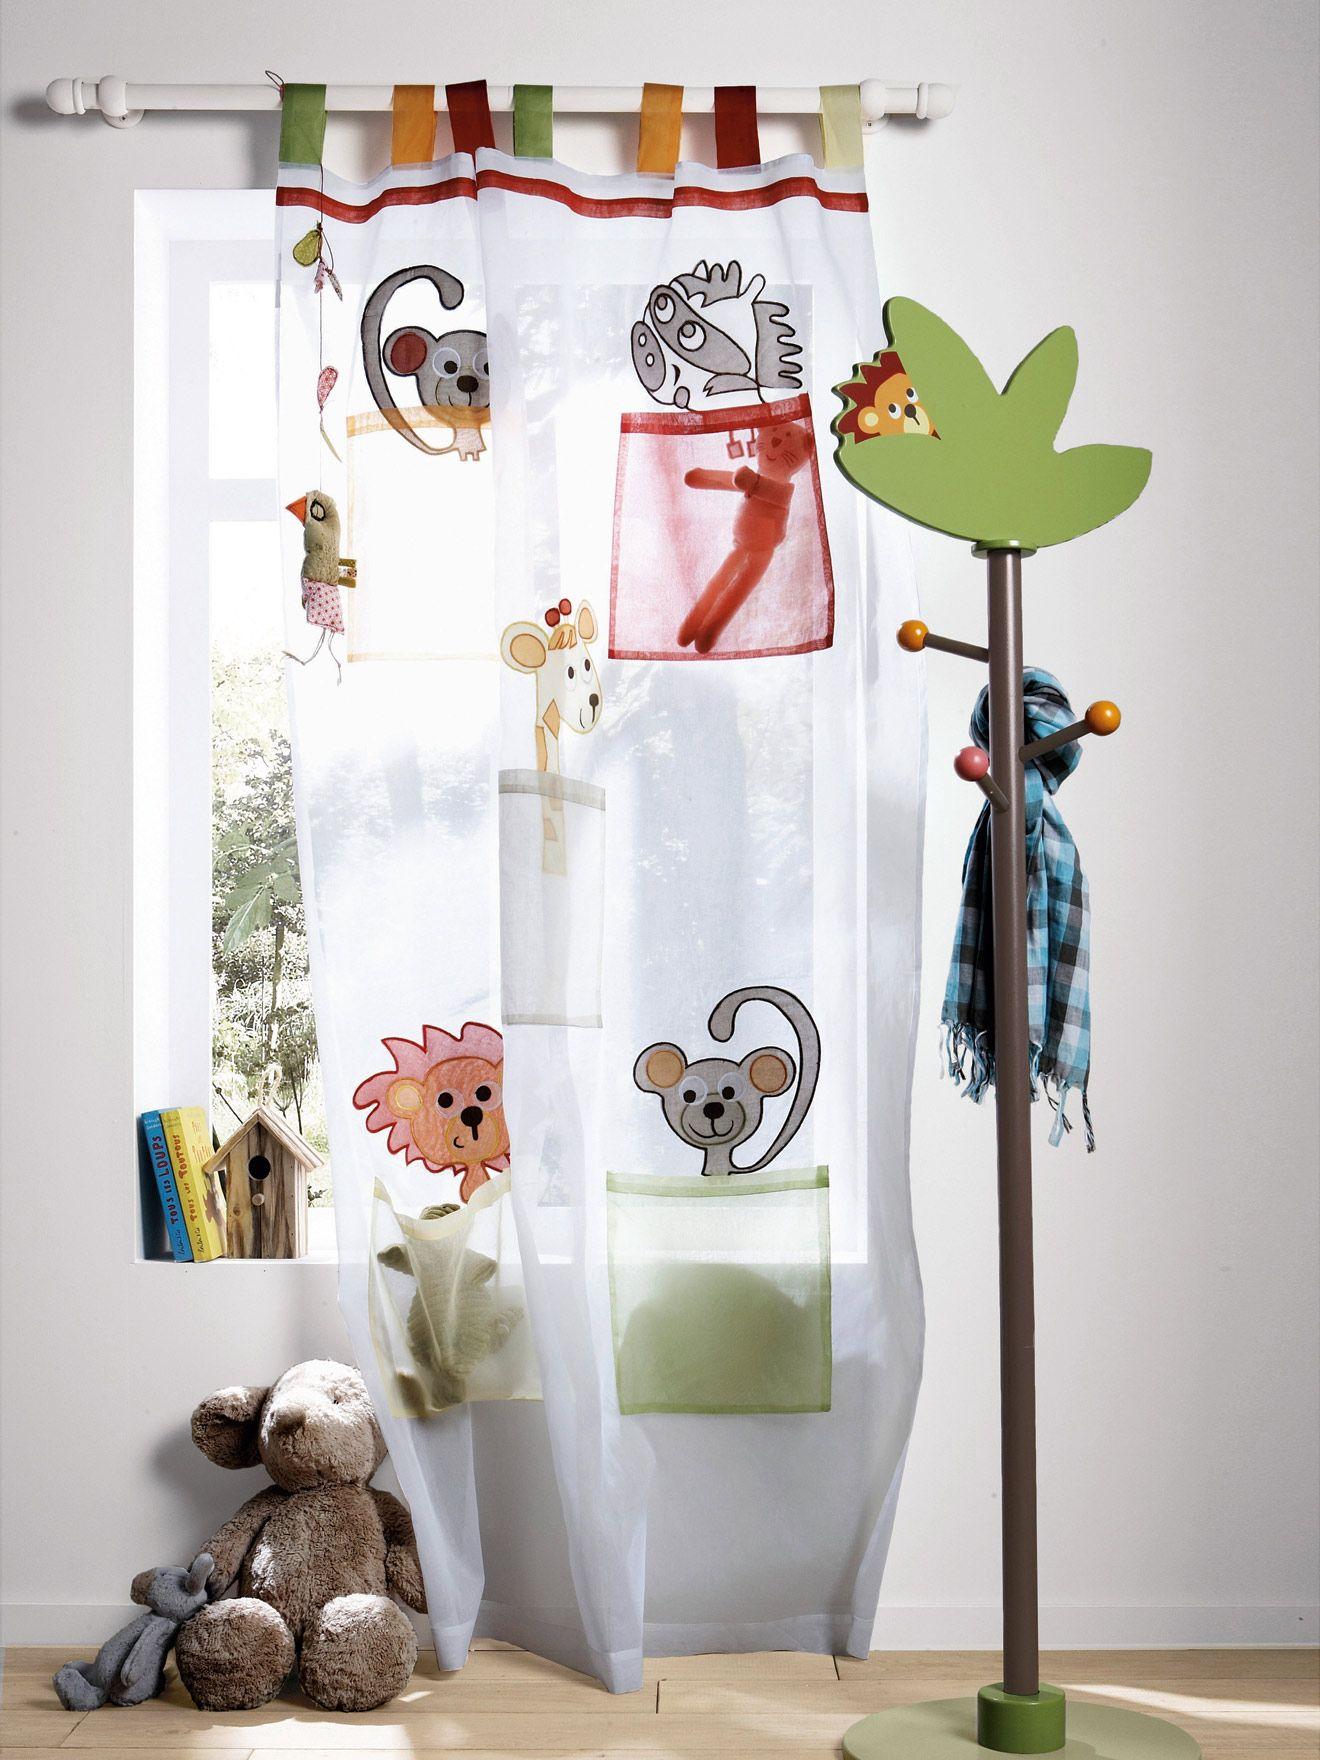 Rideau organdi animaux thème l\'as-tu vu ?, #chambre Bébé ...